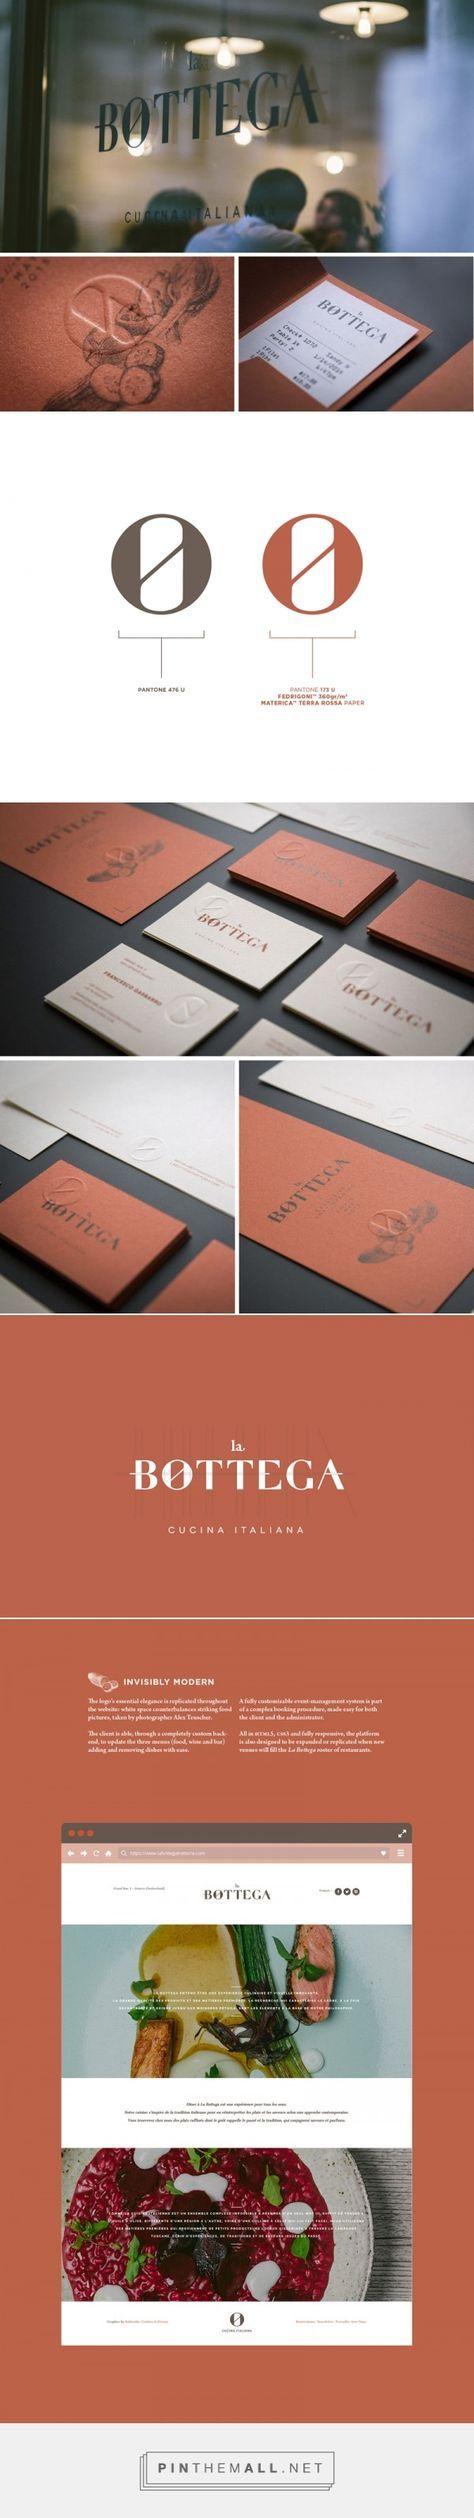 La Bottega – Restaurant Identity Design by kidstudio